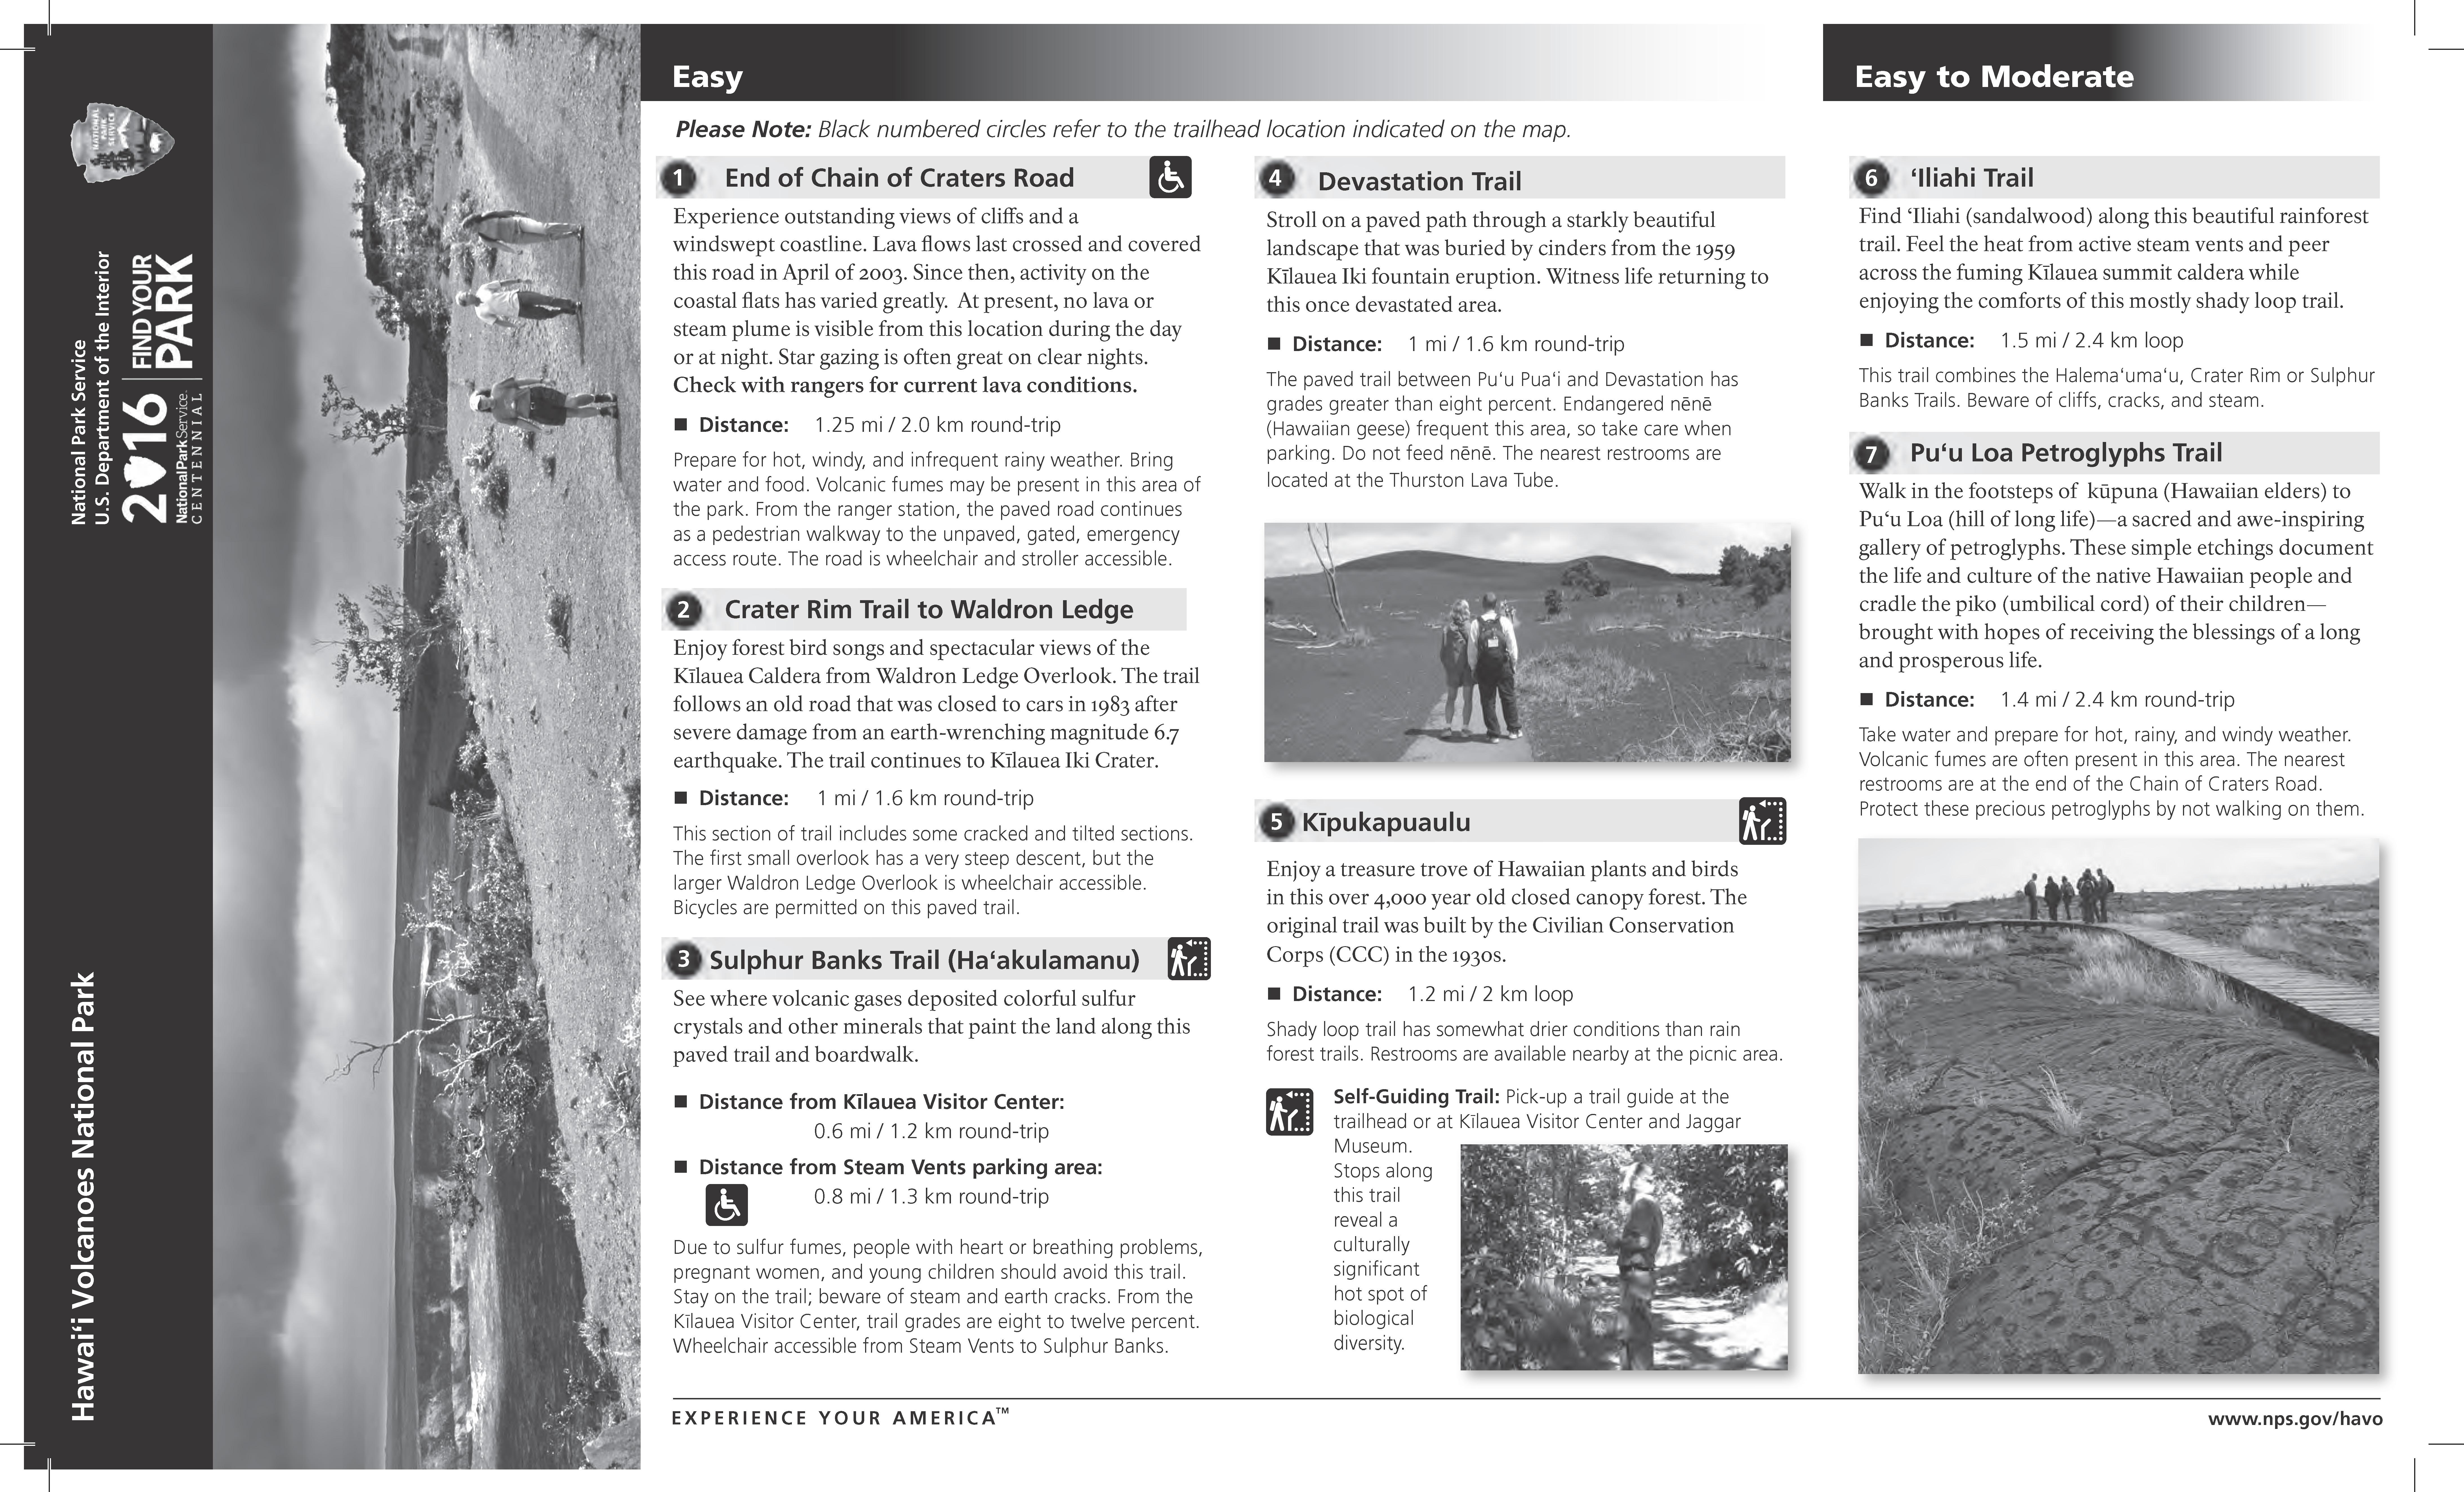 brochures hawai i volcanoes national park u s national park service